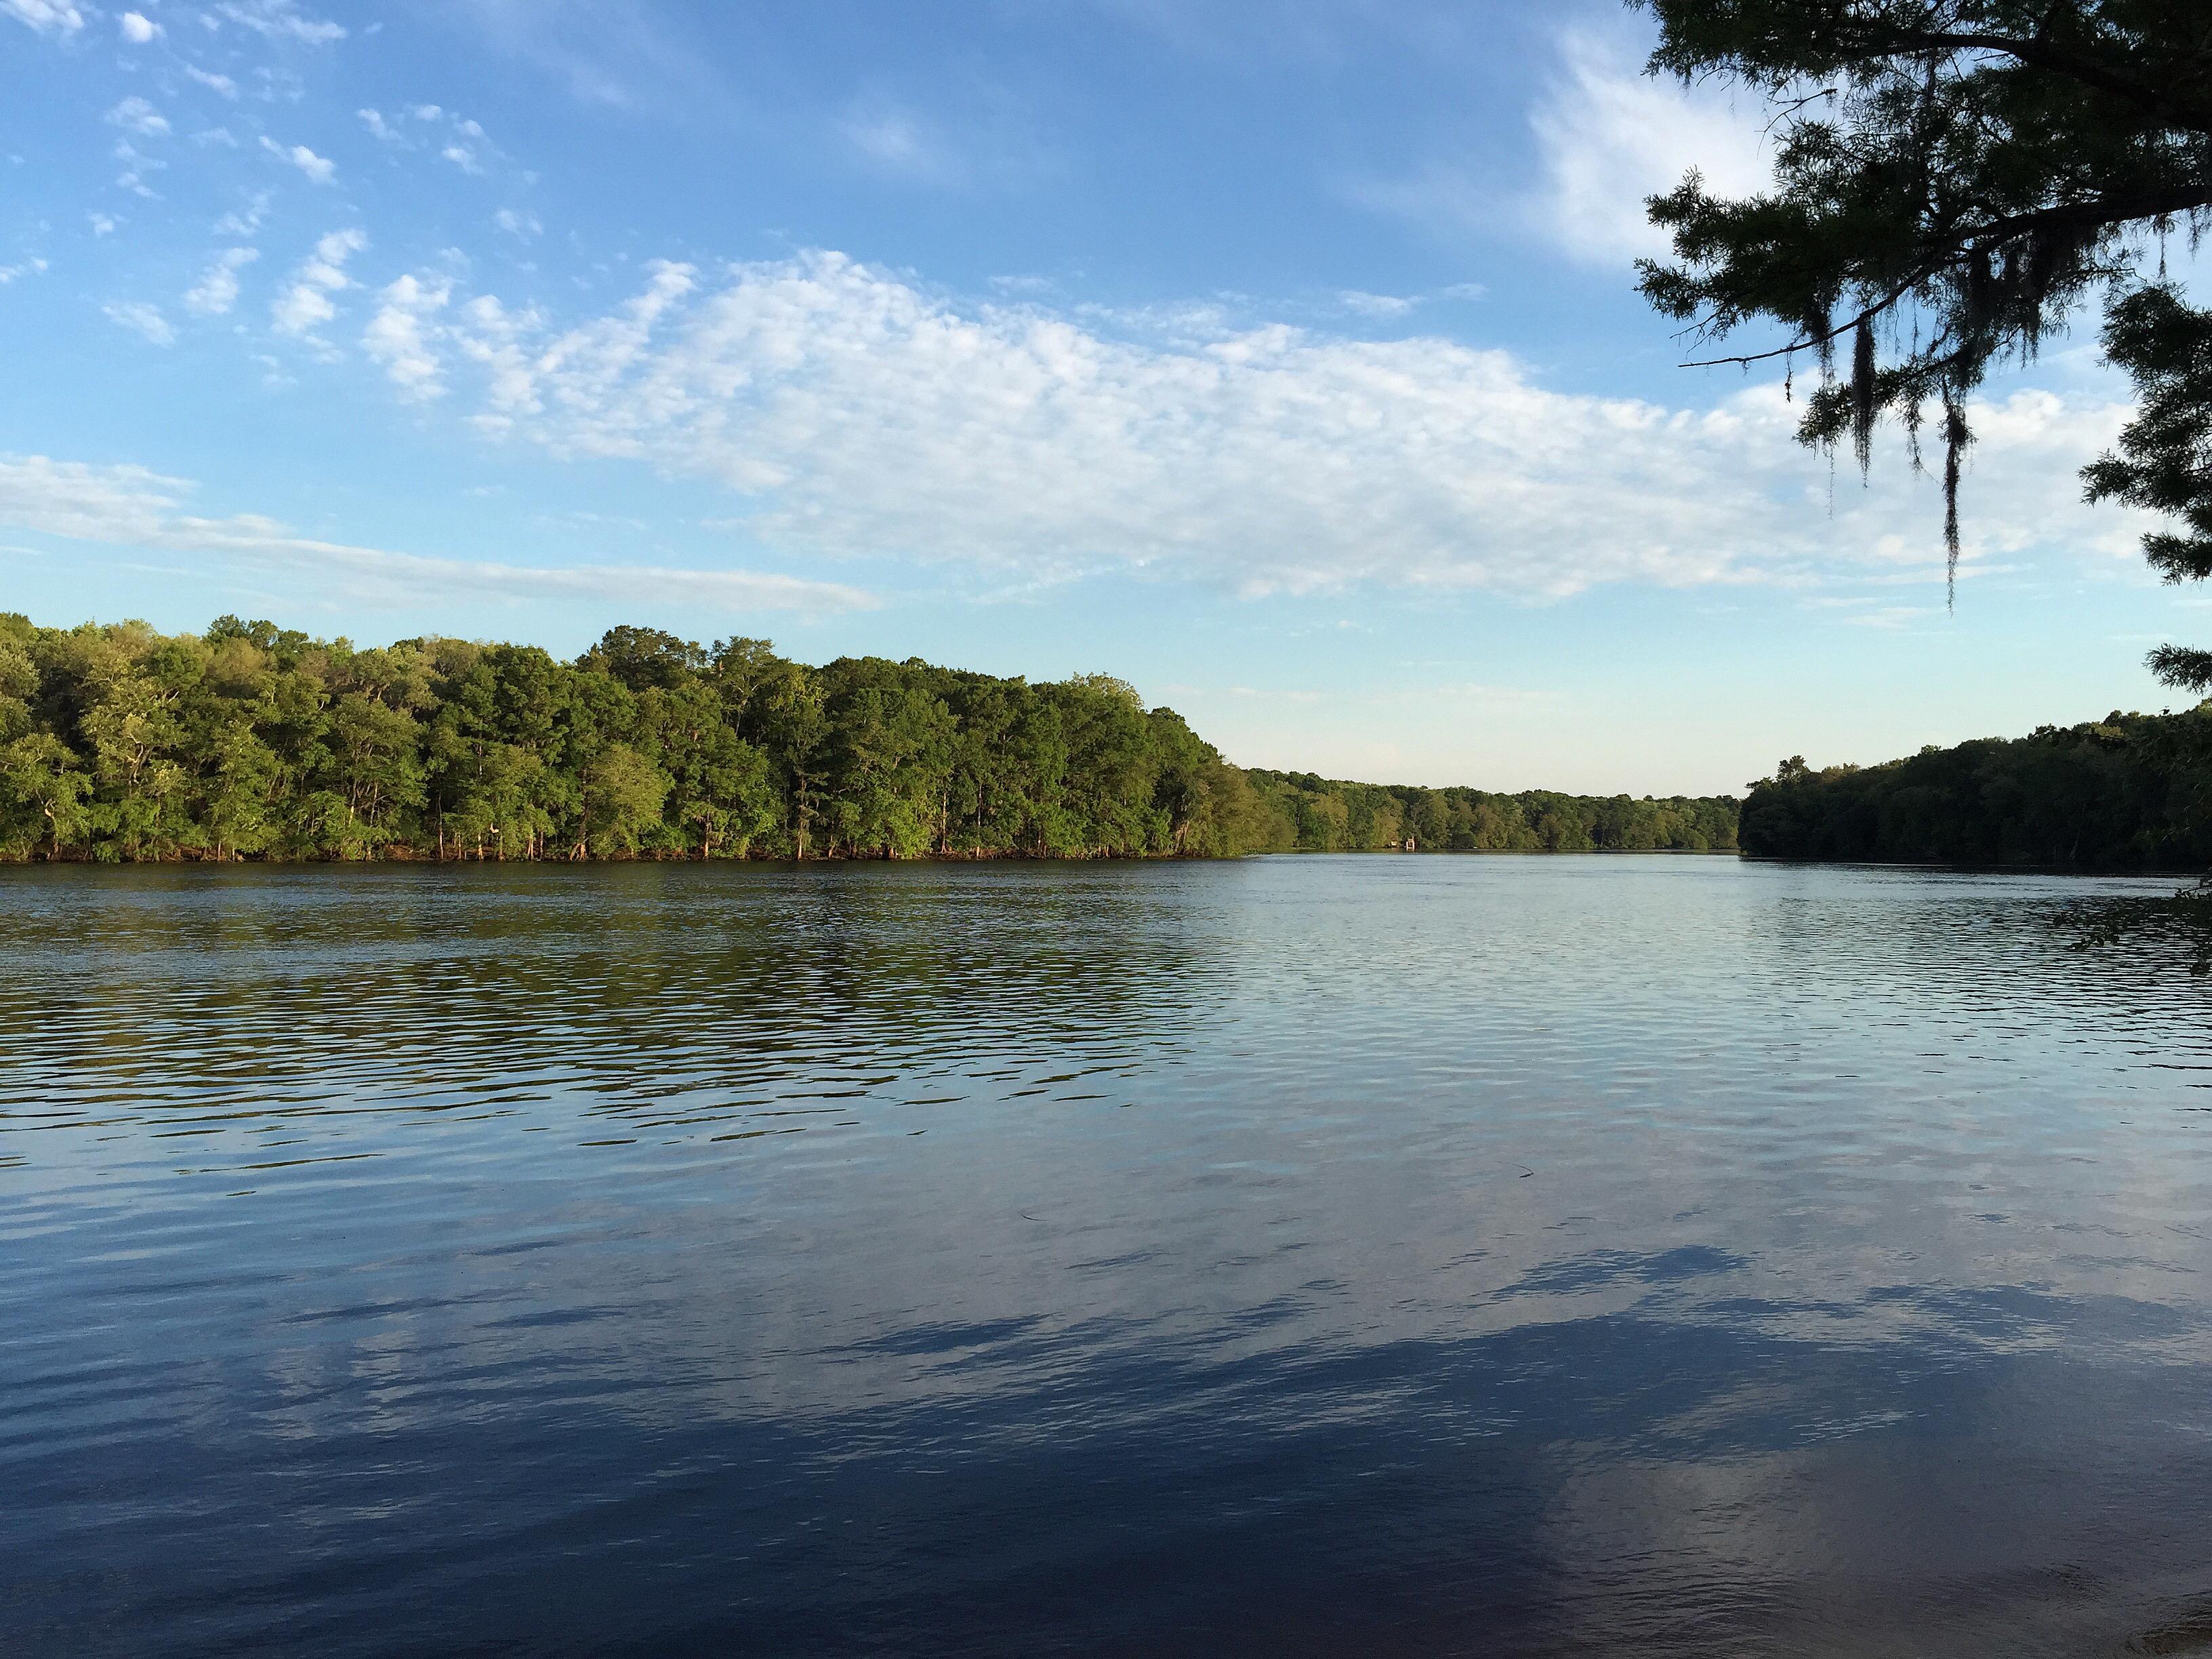 River Rise Preserve State Park Map - Florida - Mapcarta